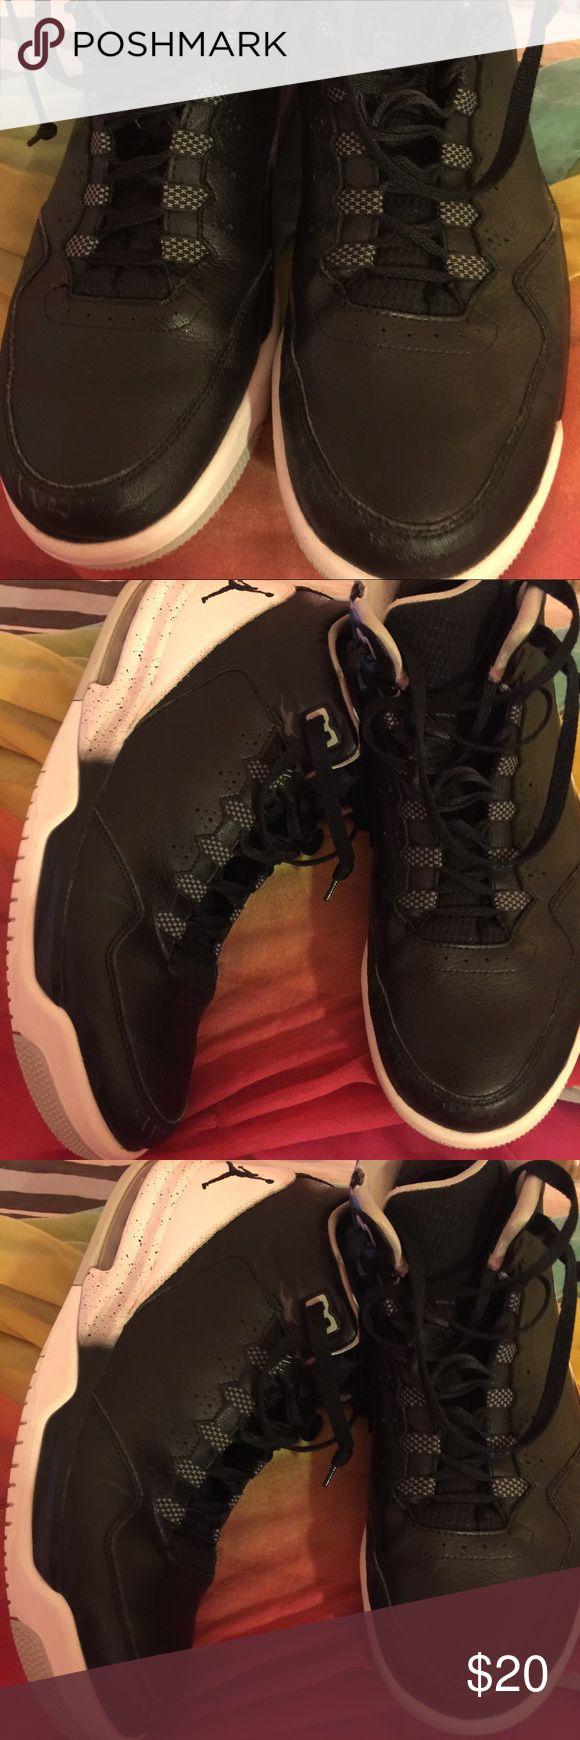 JORDAN FLIGHT TENNIS HIGH TOP USED NICE🌹❤️ JORDAN FLIGHT HIGH TOP TENNIS SHOES USED IN GOOD SHAPE SIZE 12 ❤️️🌺❤️ Jordan Shoes Sneakers